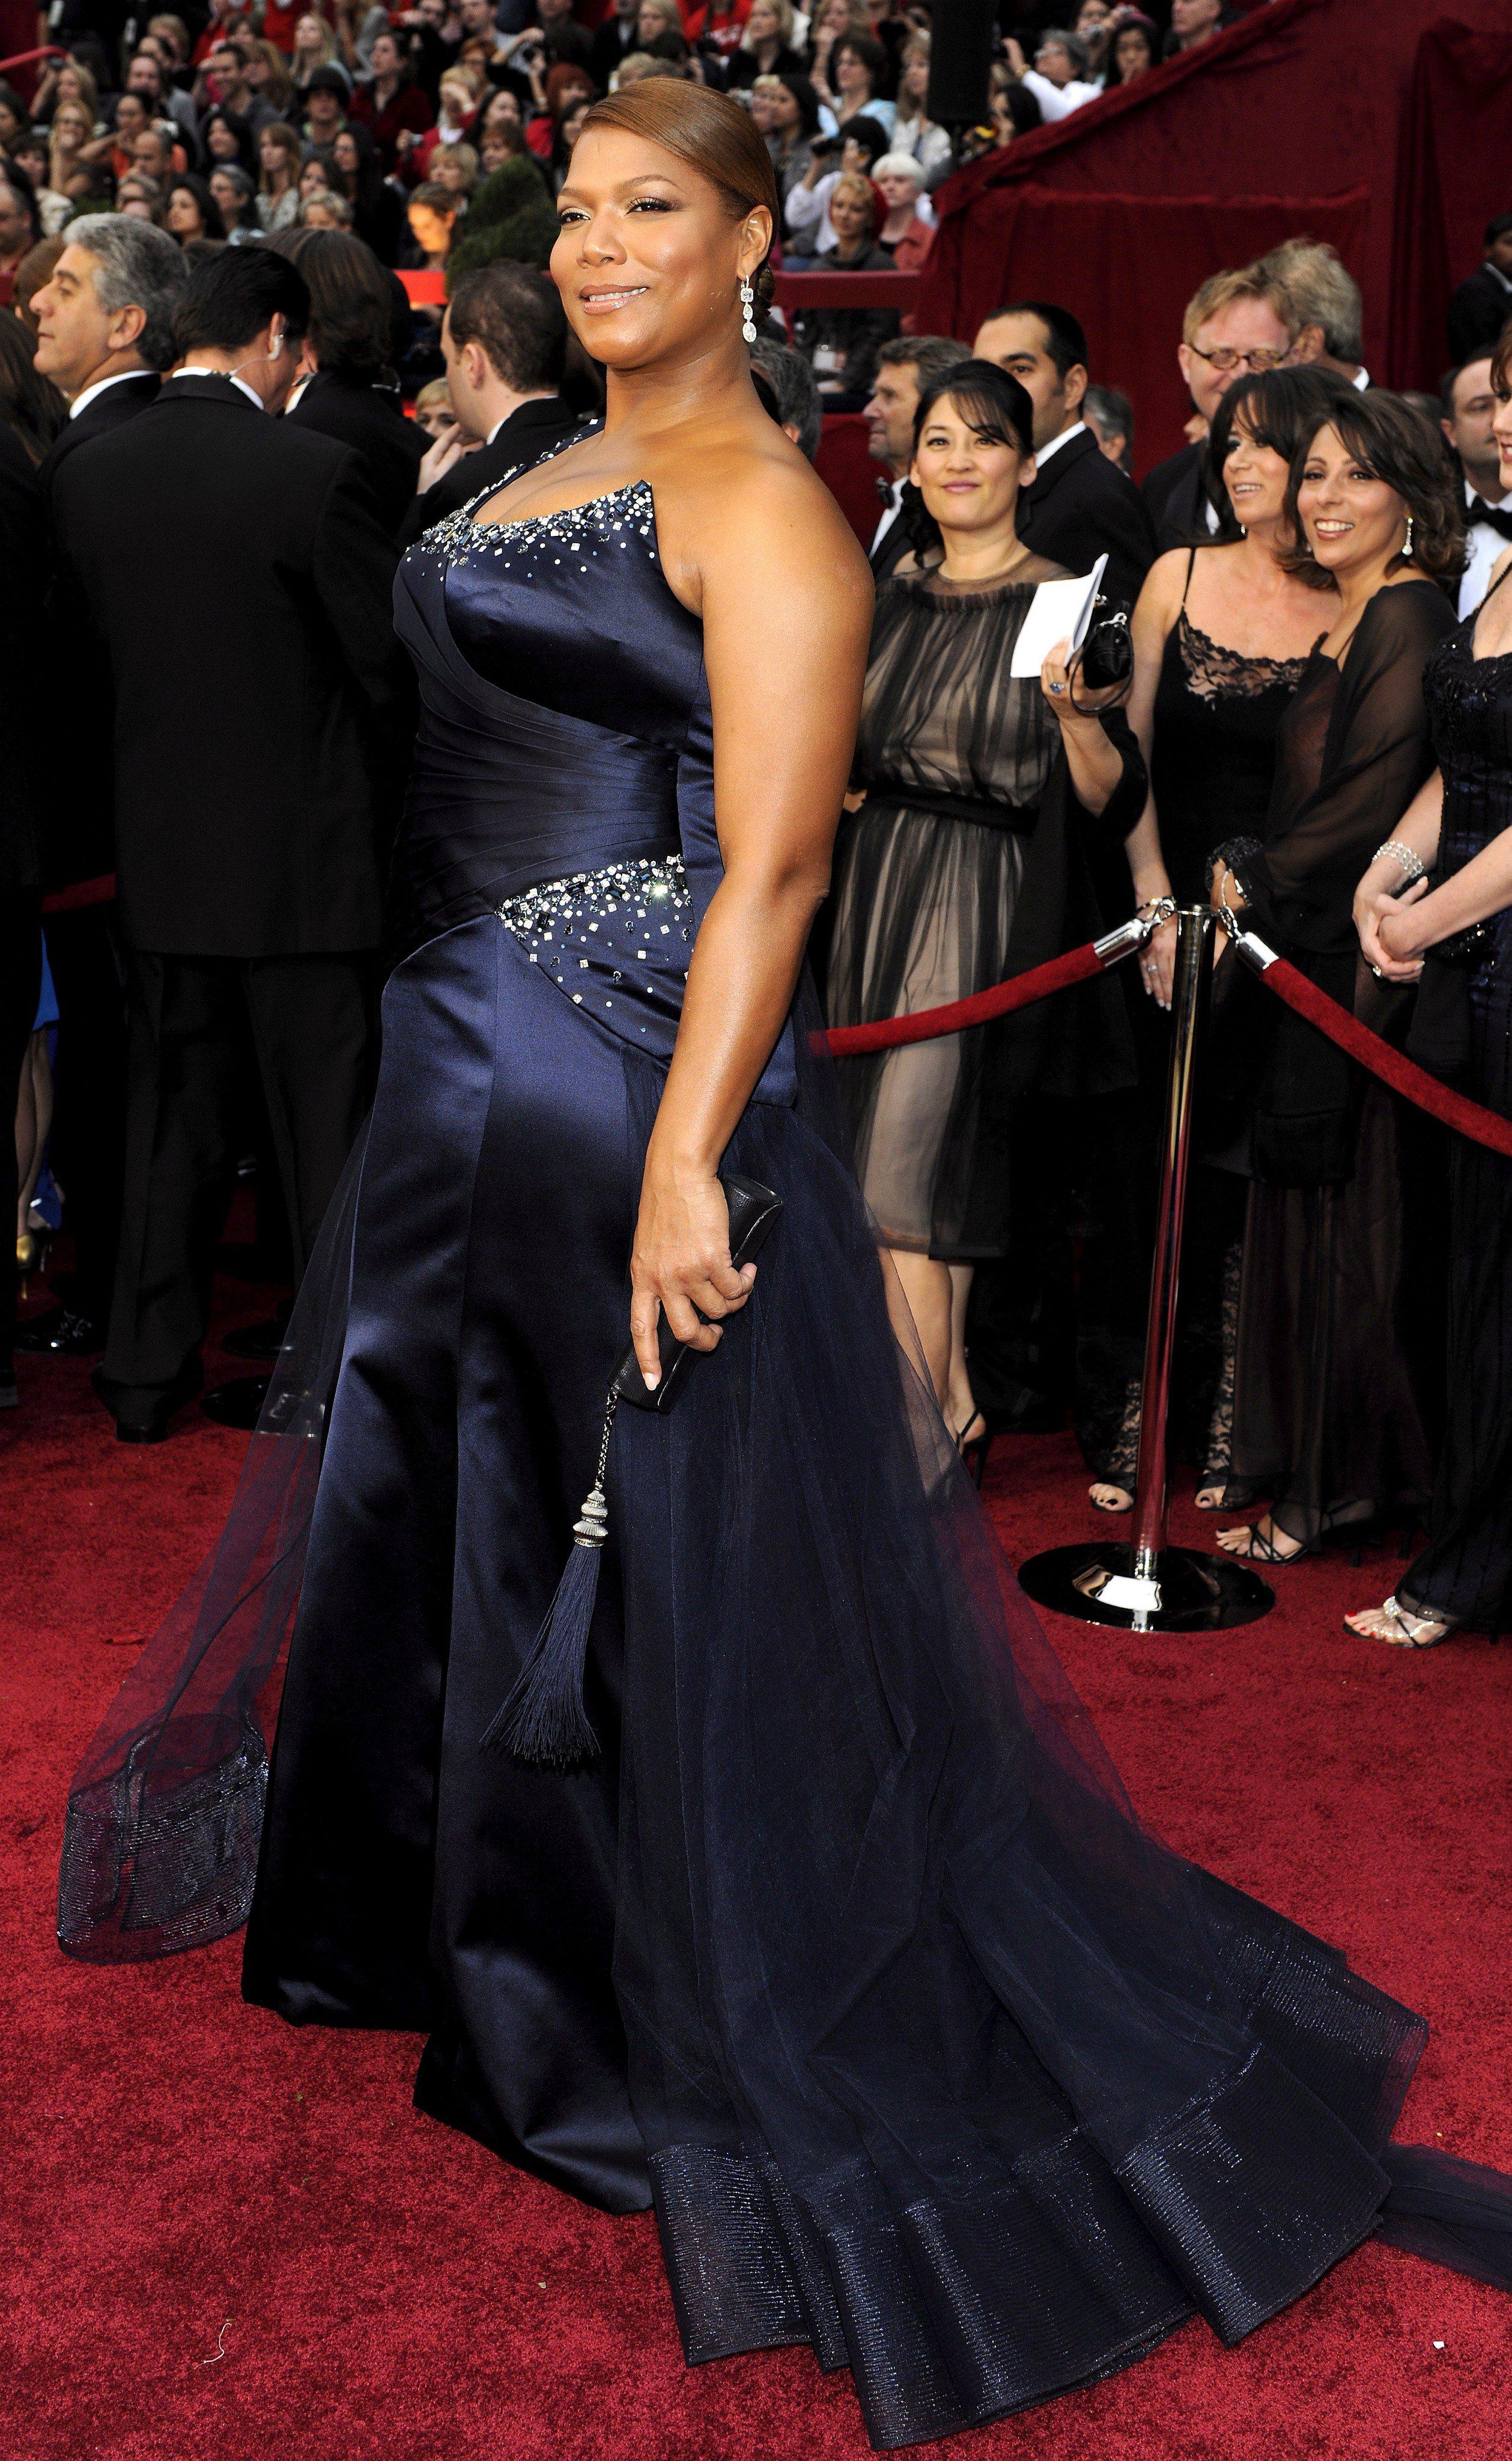 H Queen Latifah στο κόκκινο χαλί των Όσκαρ